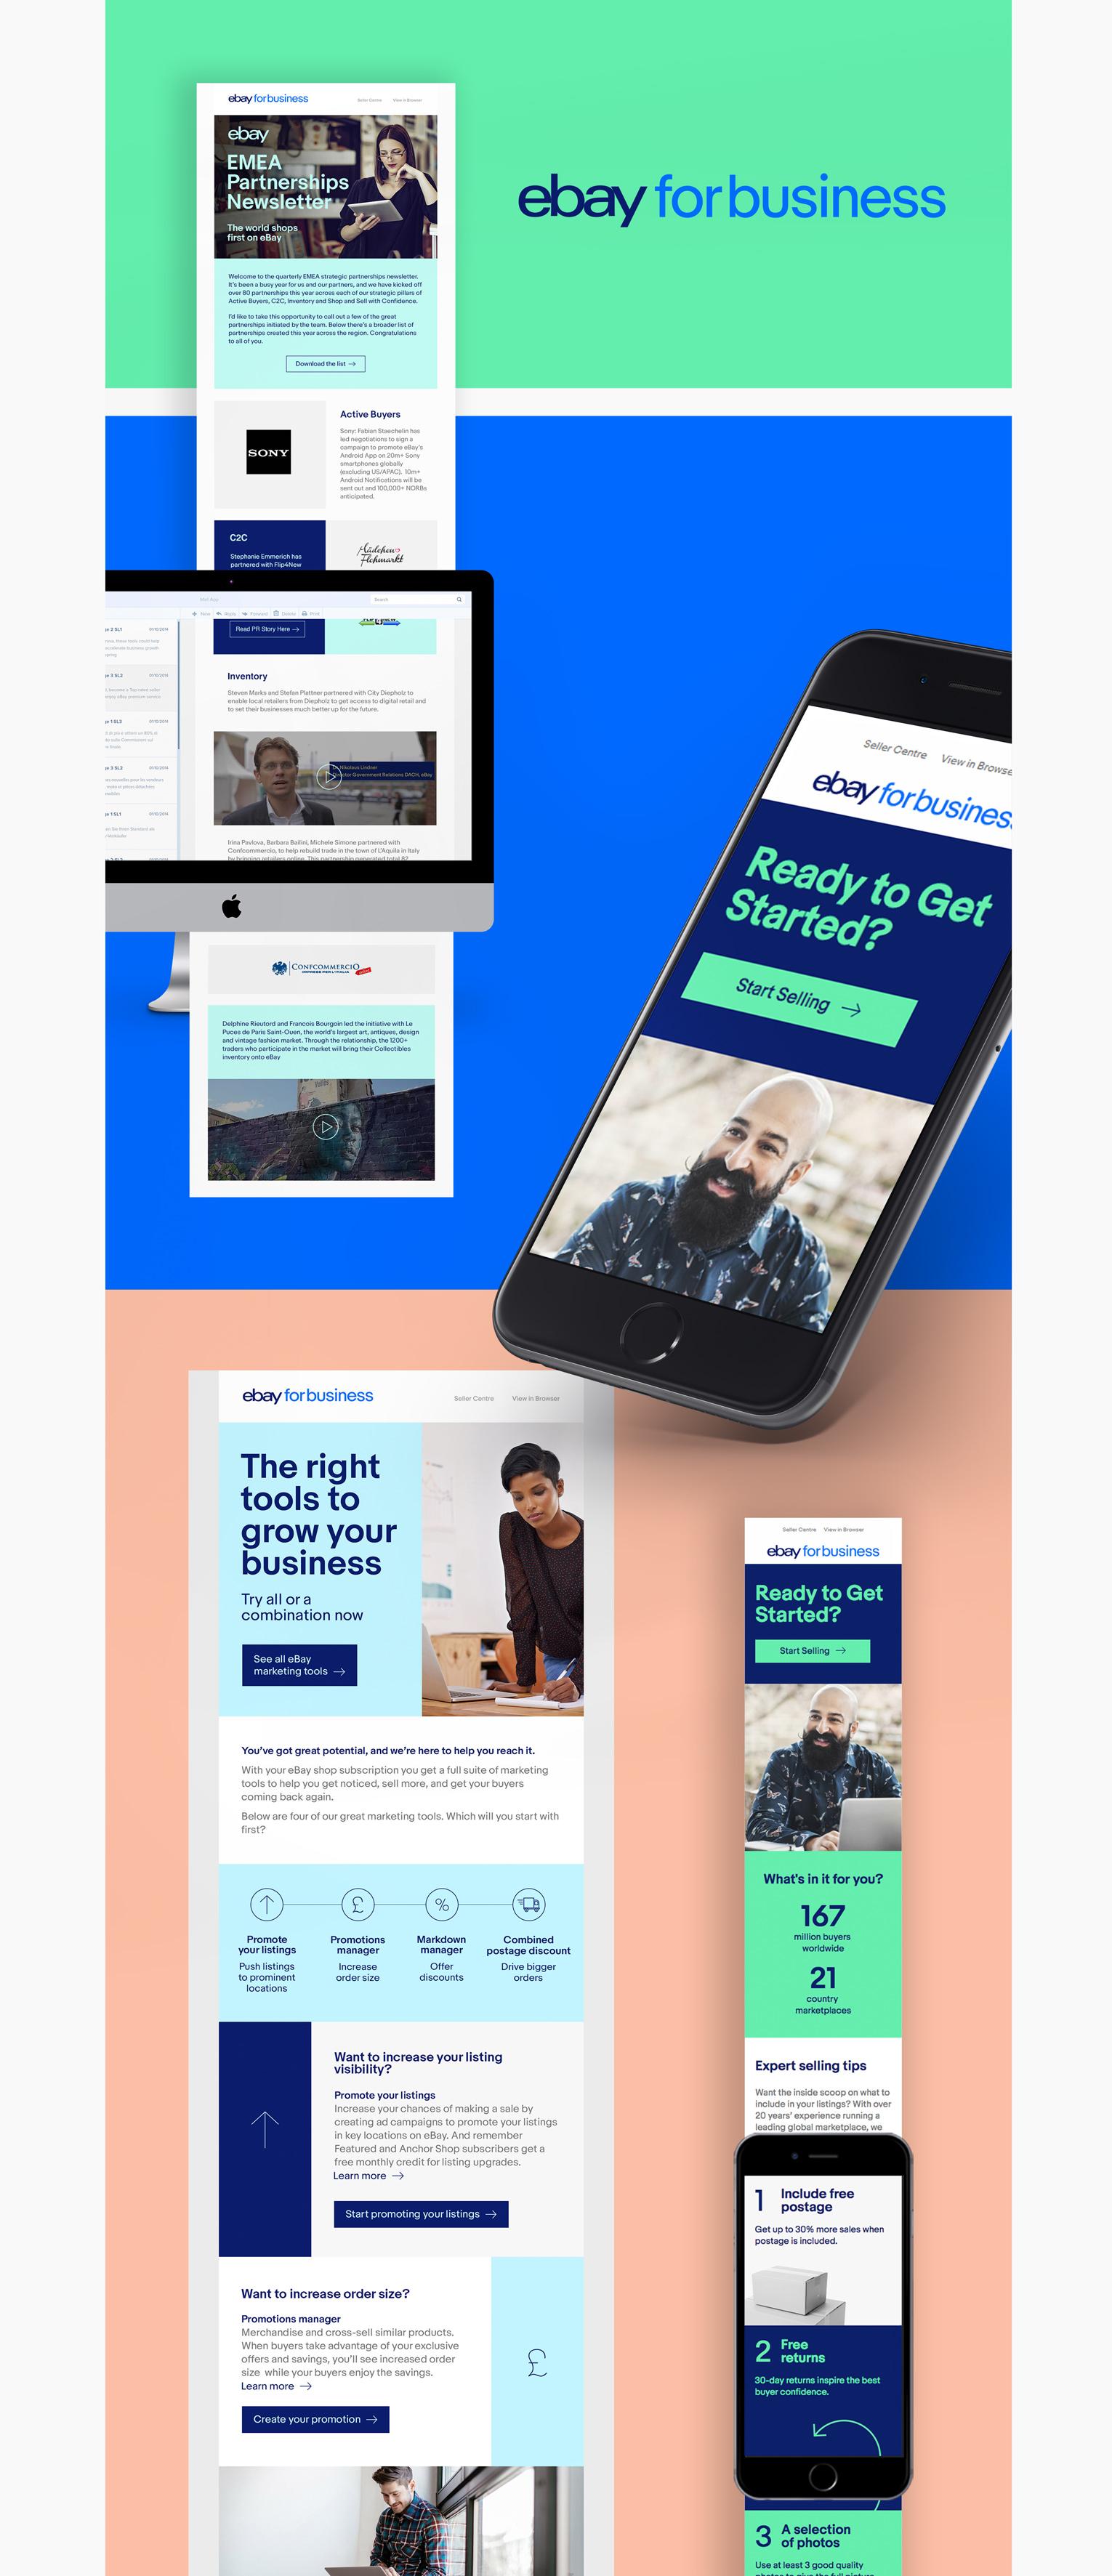 ebayforbusiness_campaign1p